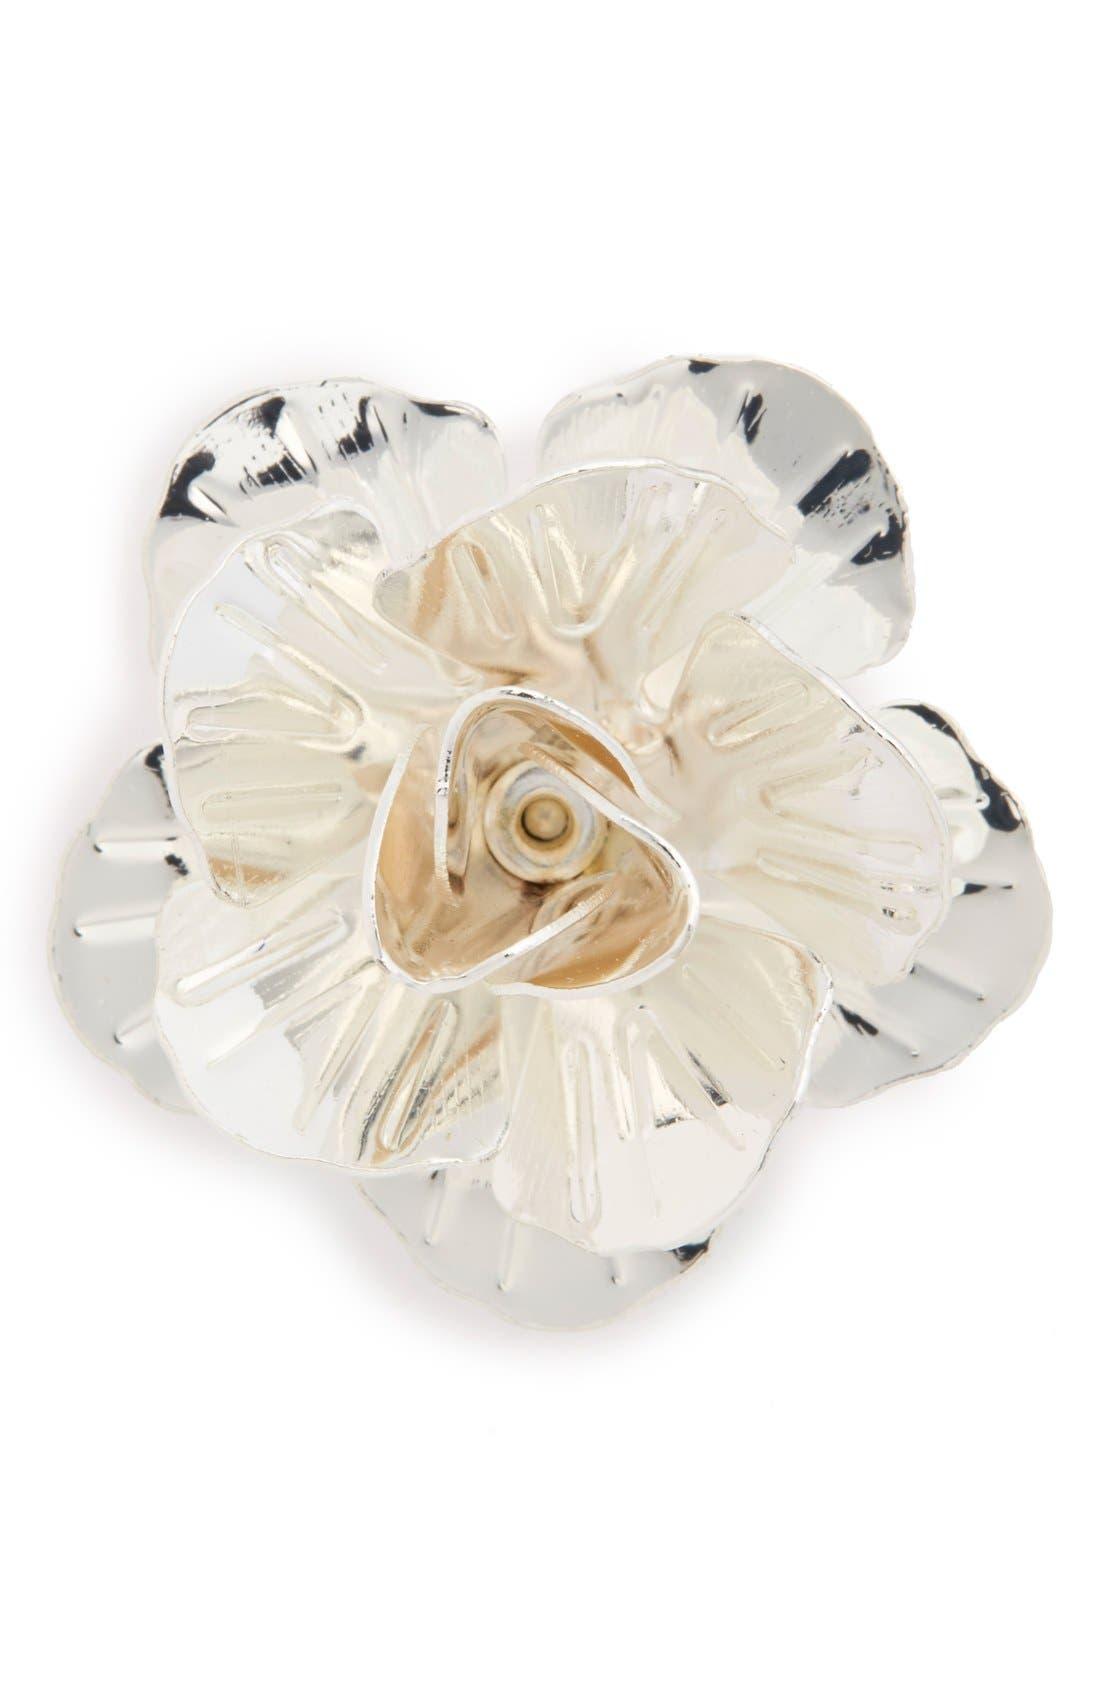 HOOK + ALBERT Metallic Floral Lapel Pin, Main, color, SILVER